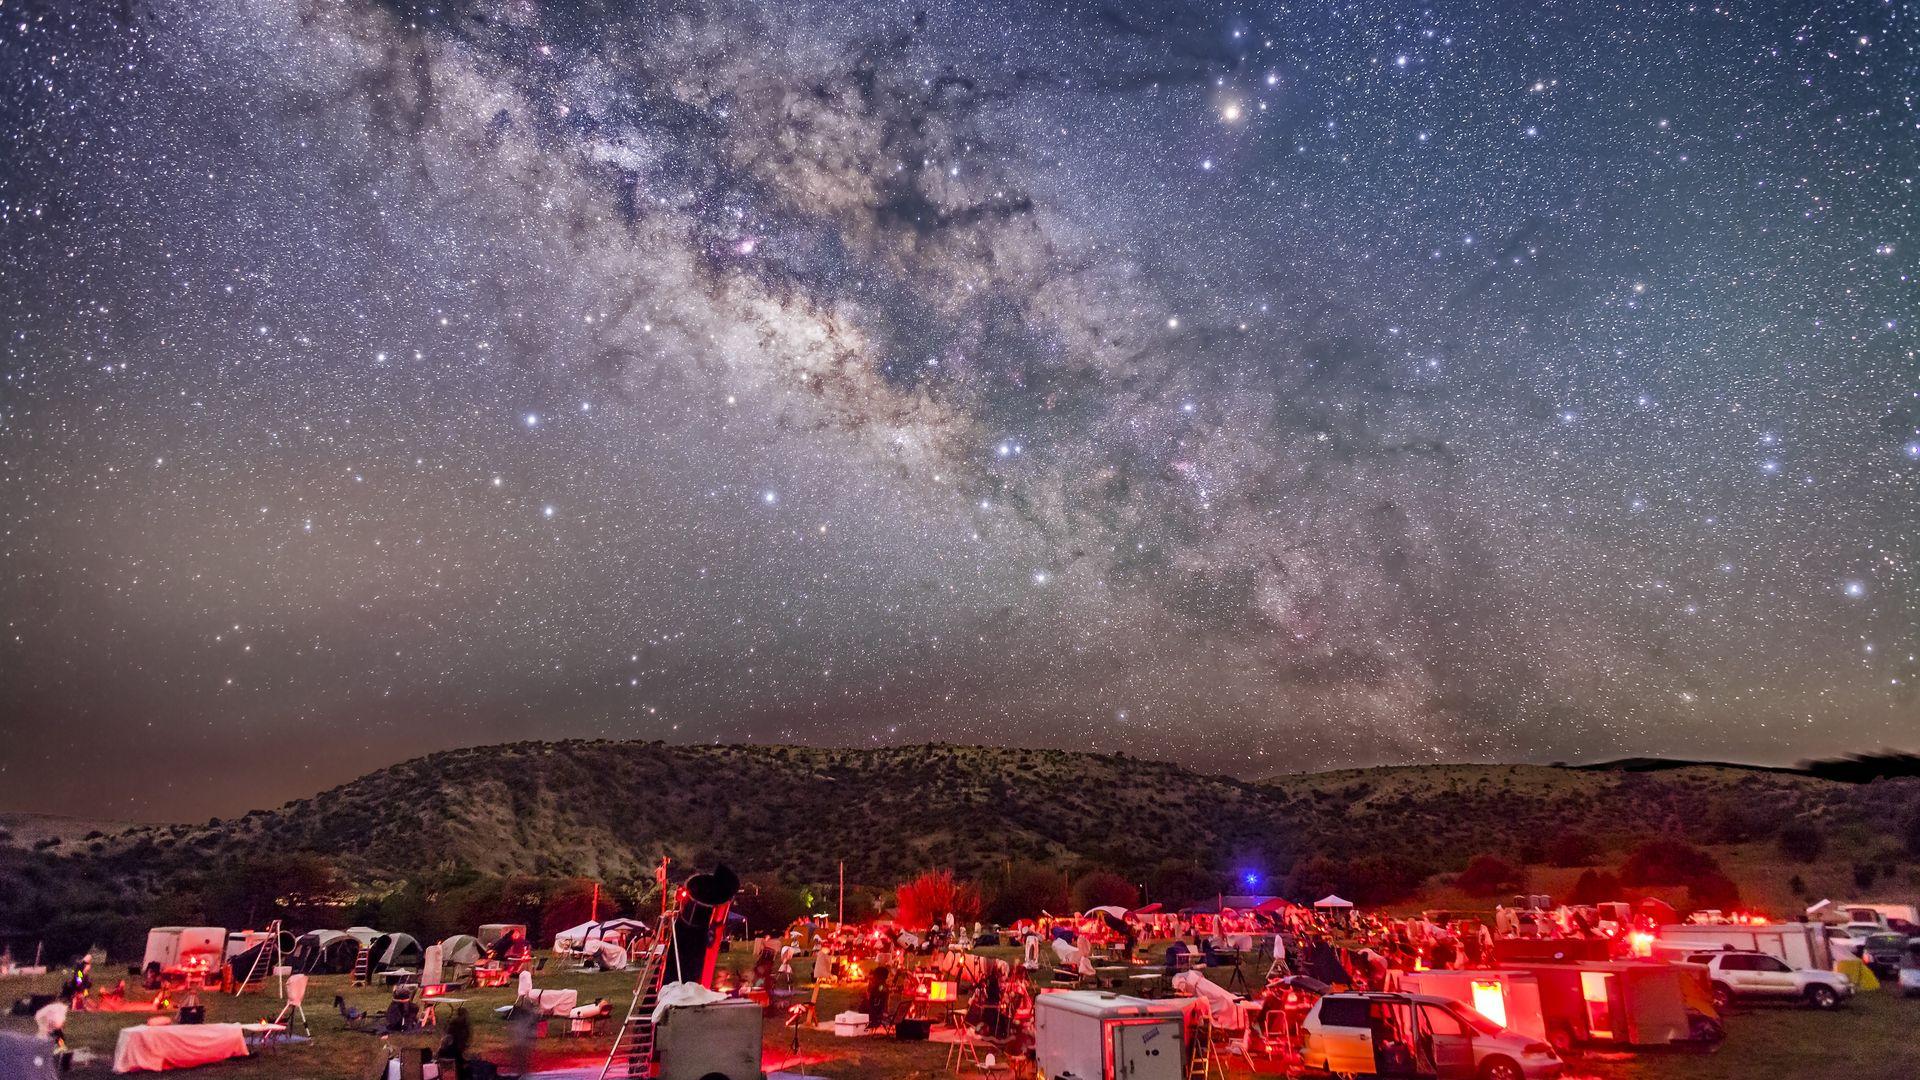 The Milky Way, as seen over Fort Davis, Texas